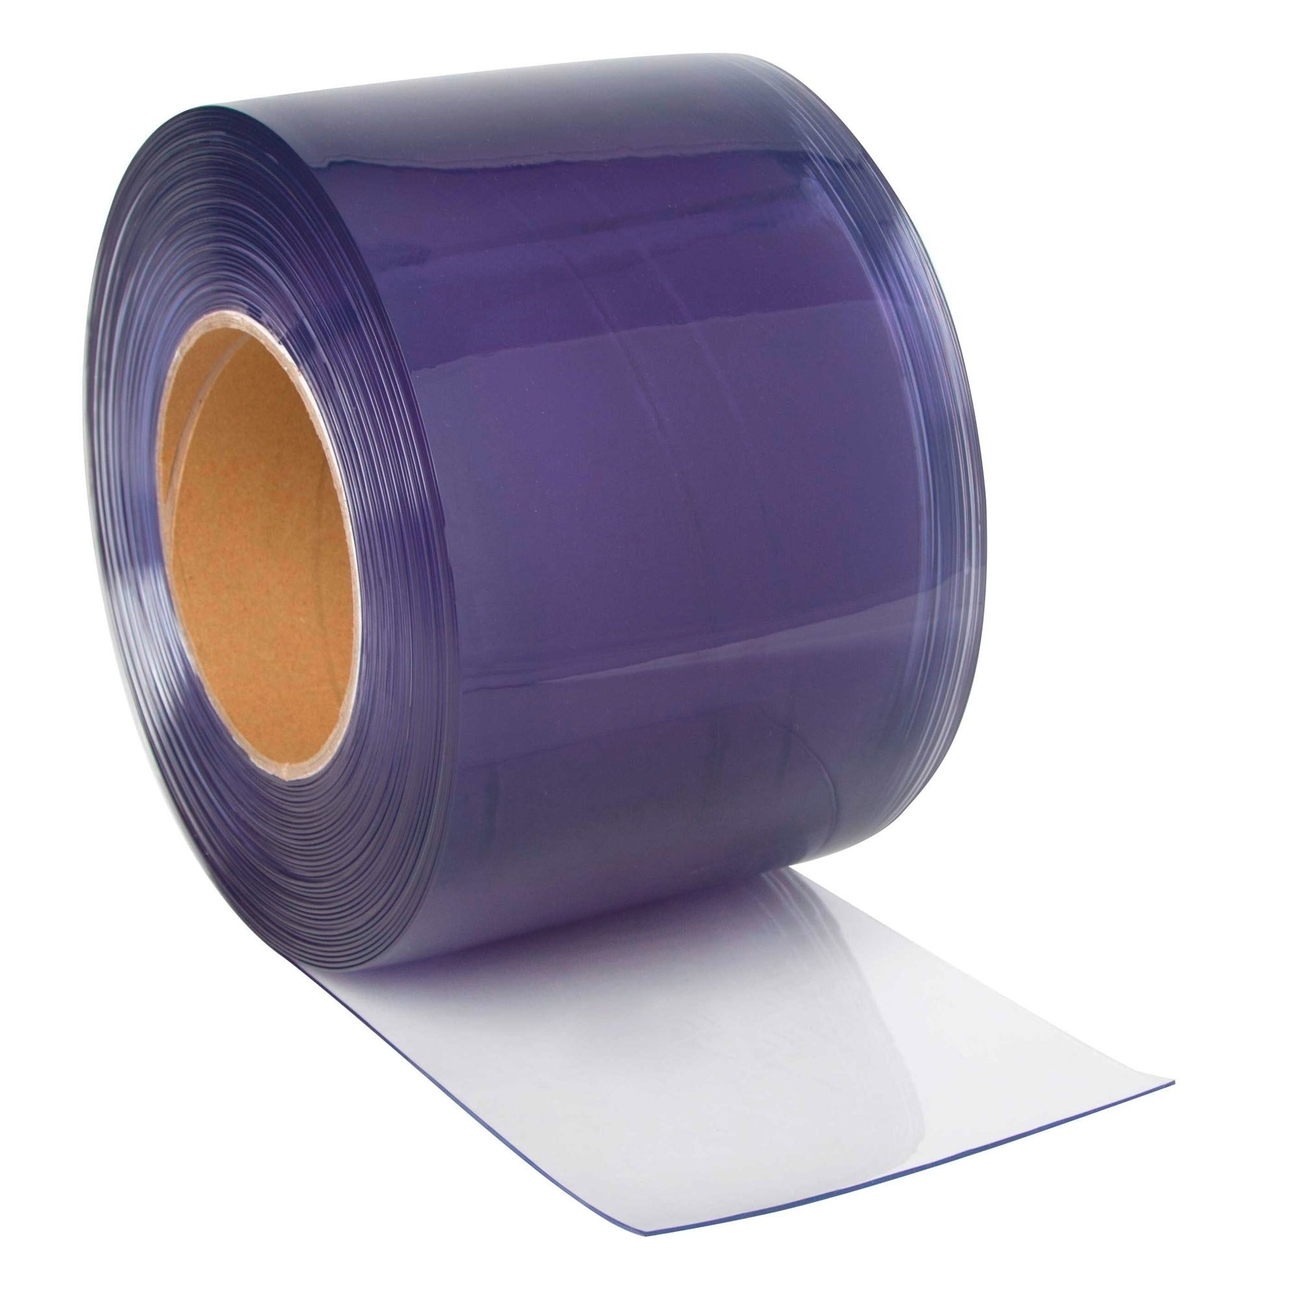 Kerbl PVC-Streifenvorhang, Bild 2